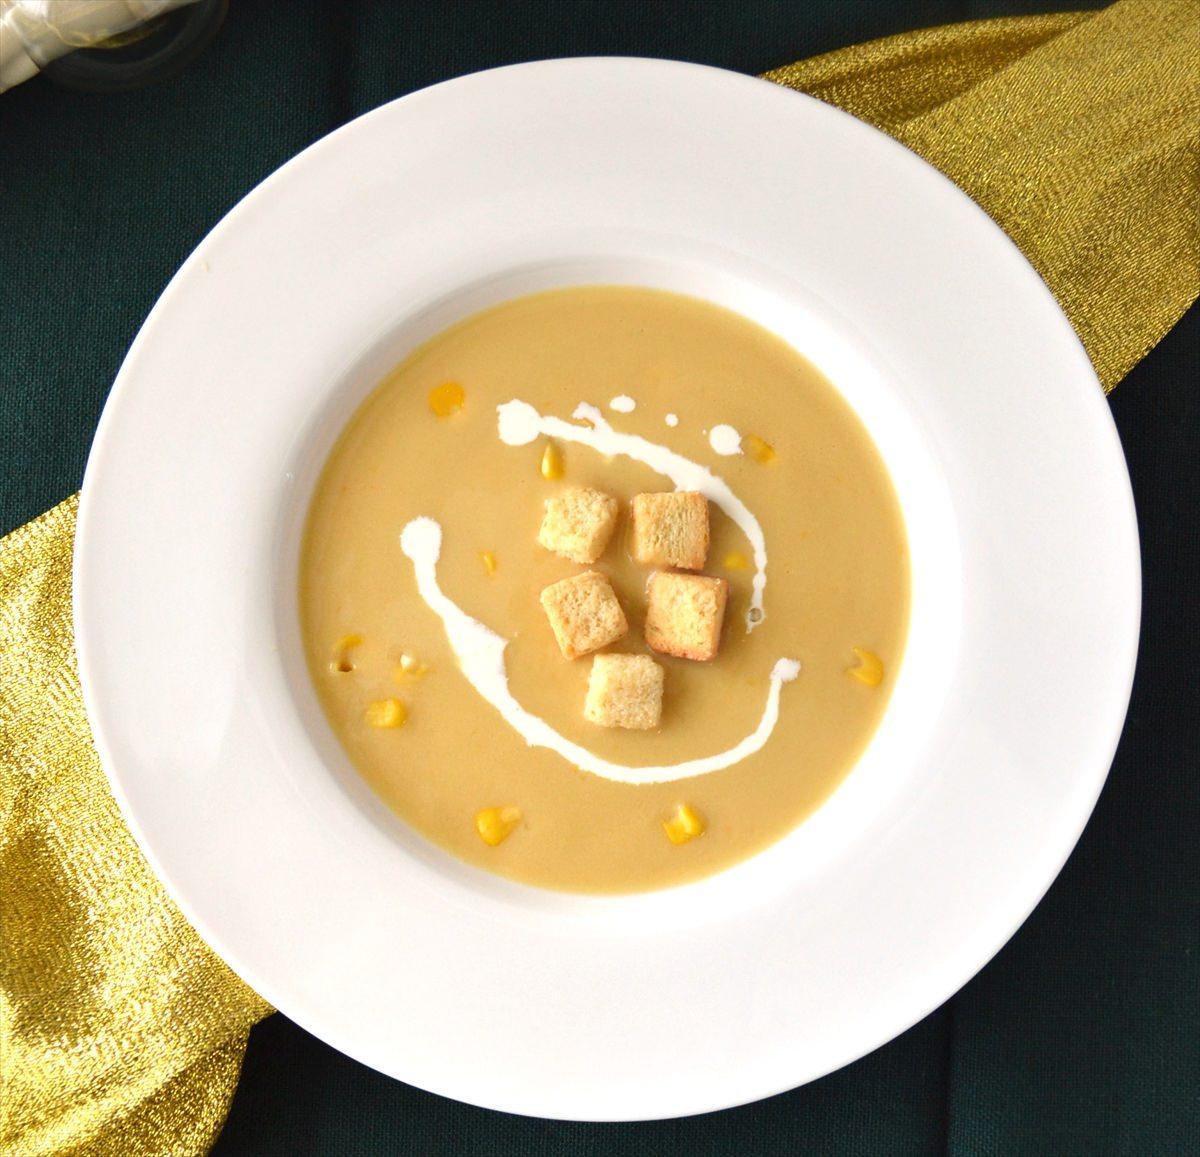 BUONO TAVOLA 美食カレー&重宝スープ詰合せ B〔カレー全2種×各2、スープ×全3種4個〕